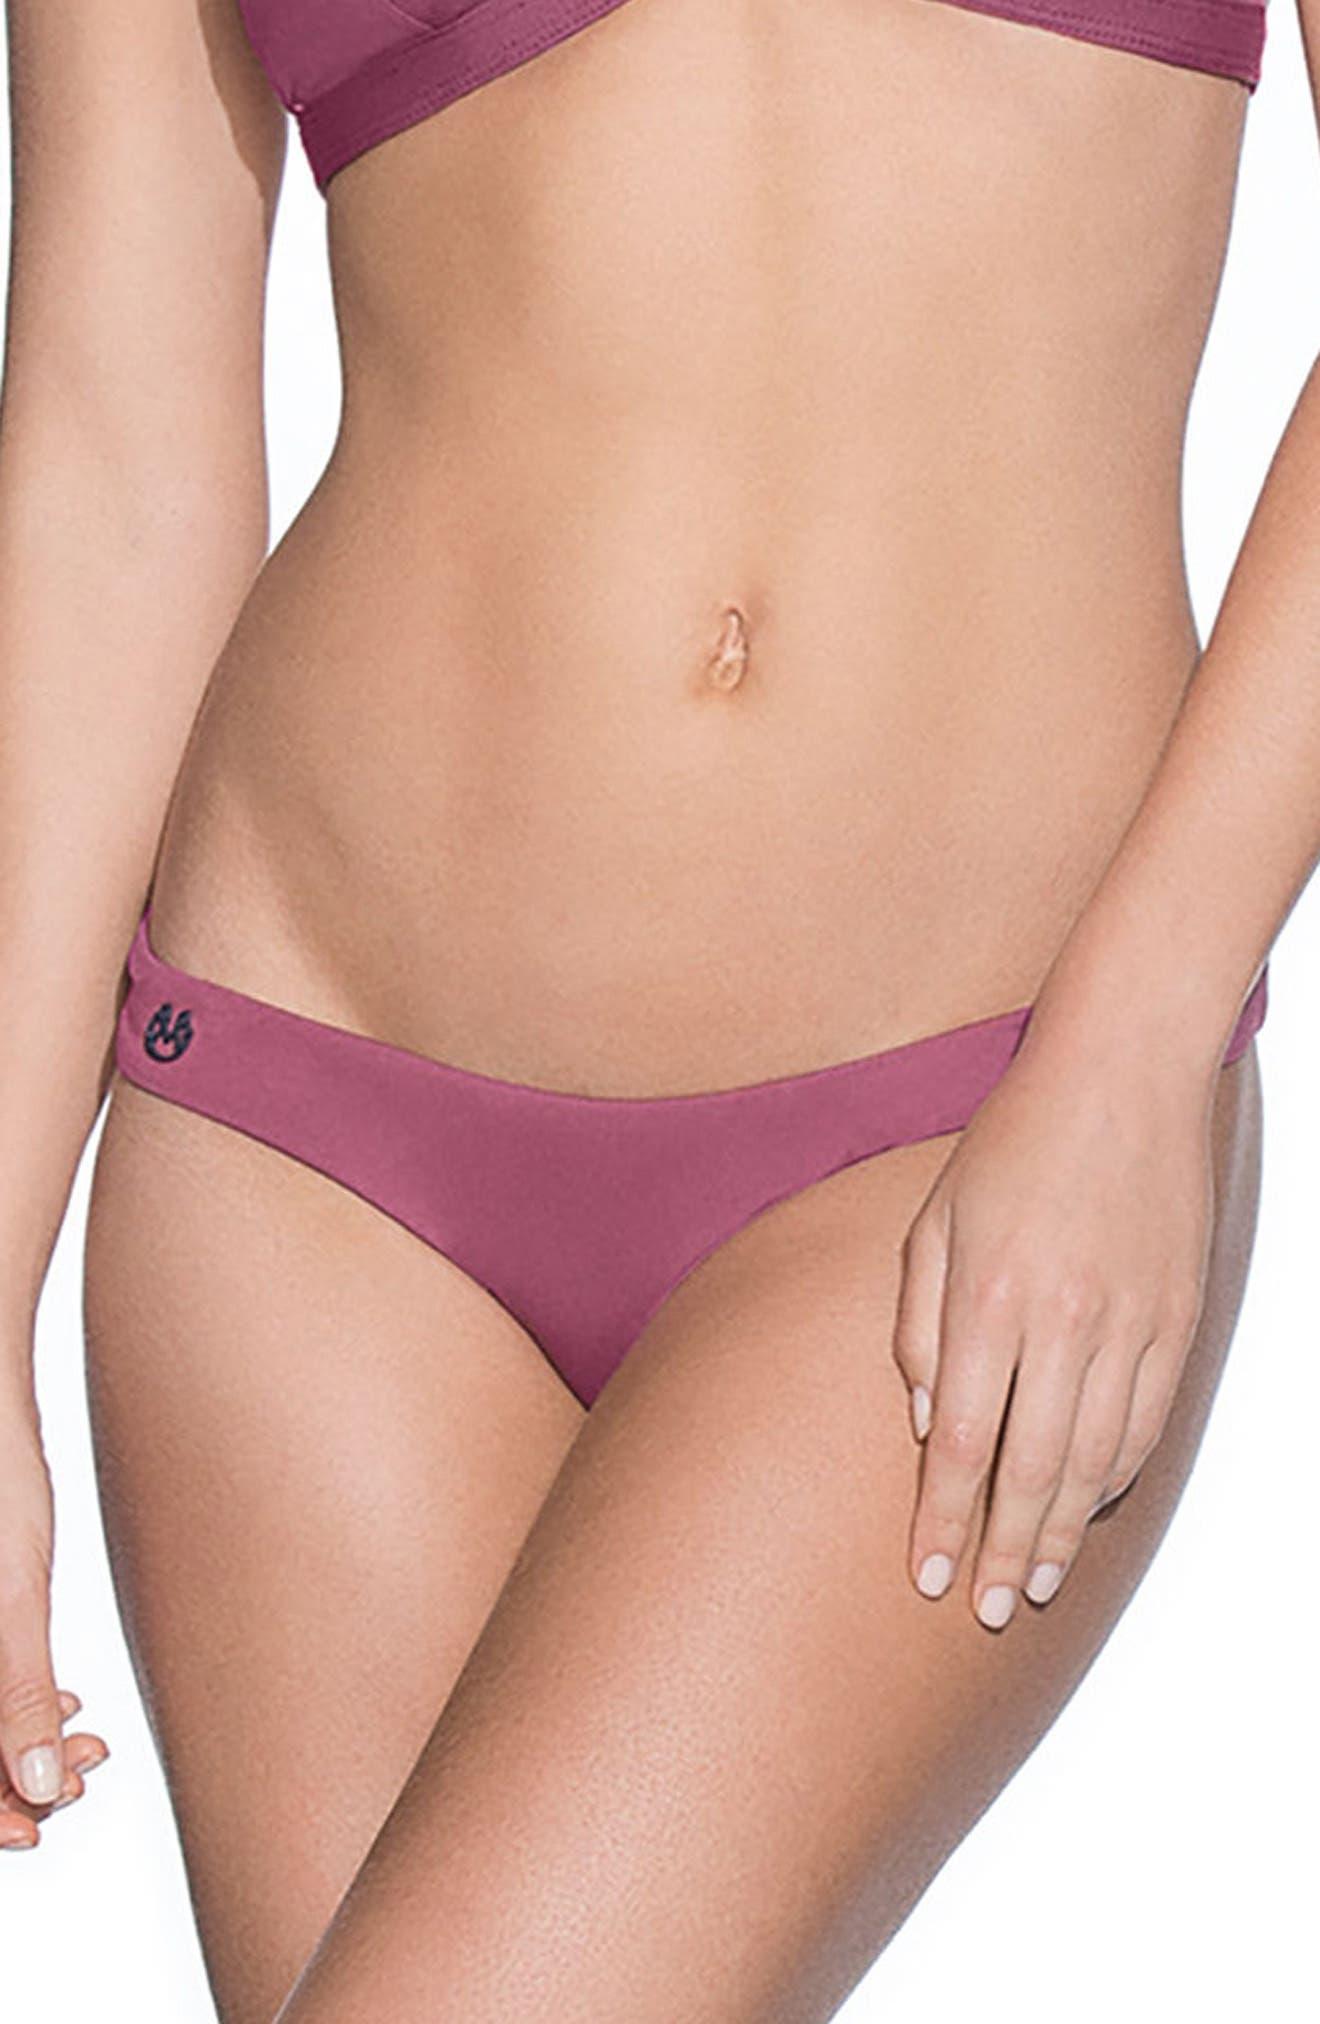 Juneberry Flirt Reversible Bikini Bottoms,                             Main thumbnail 1, color,                             Juneberry